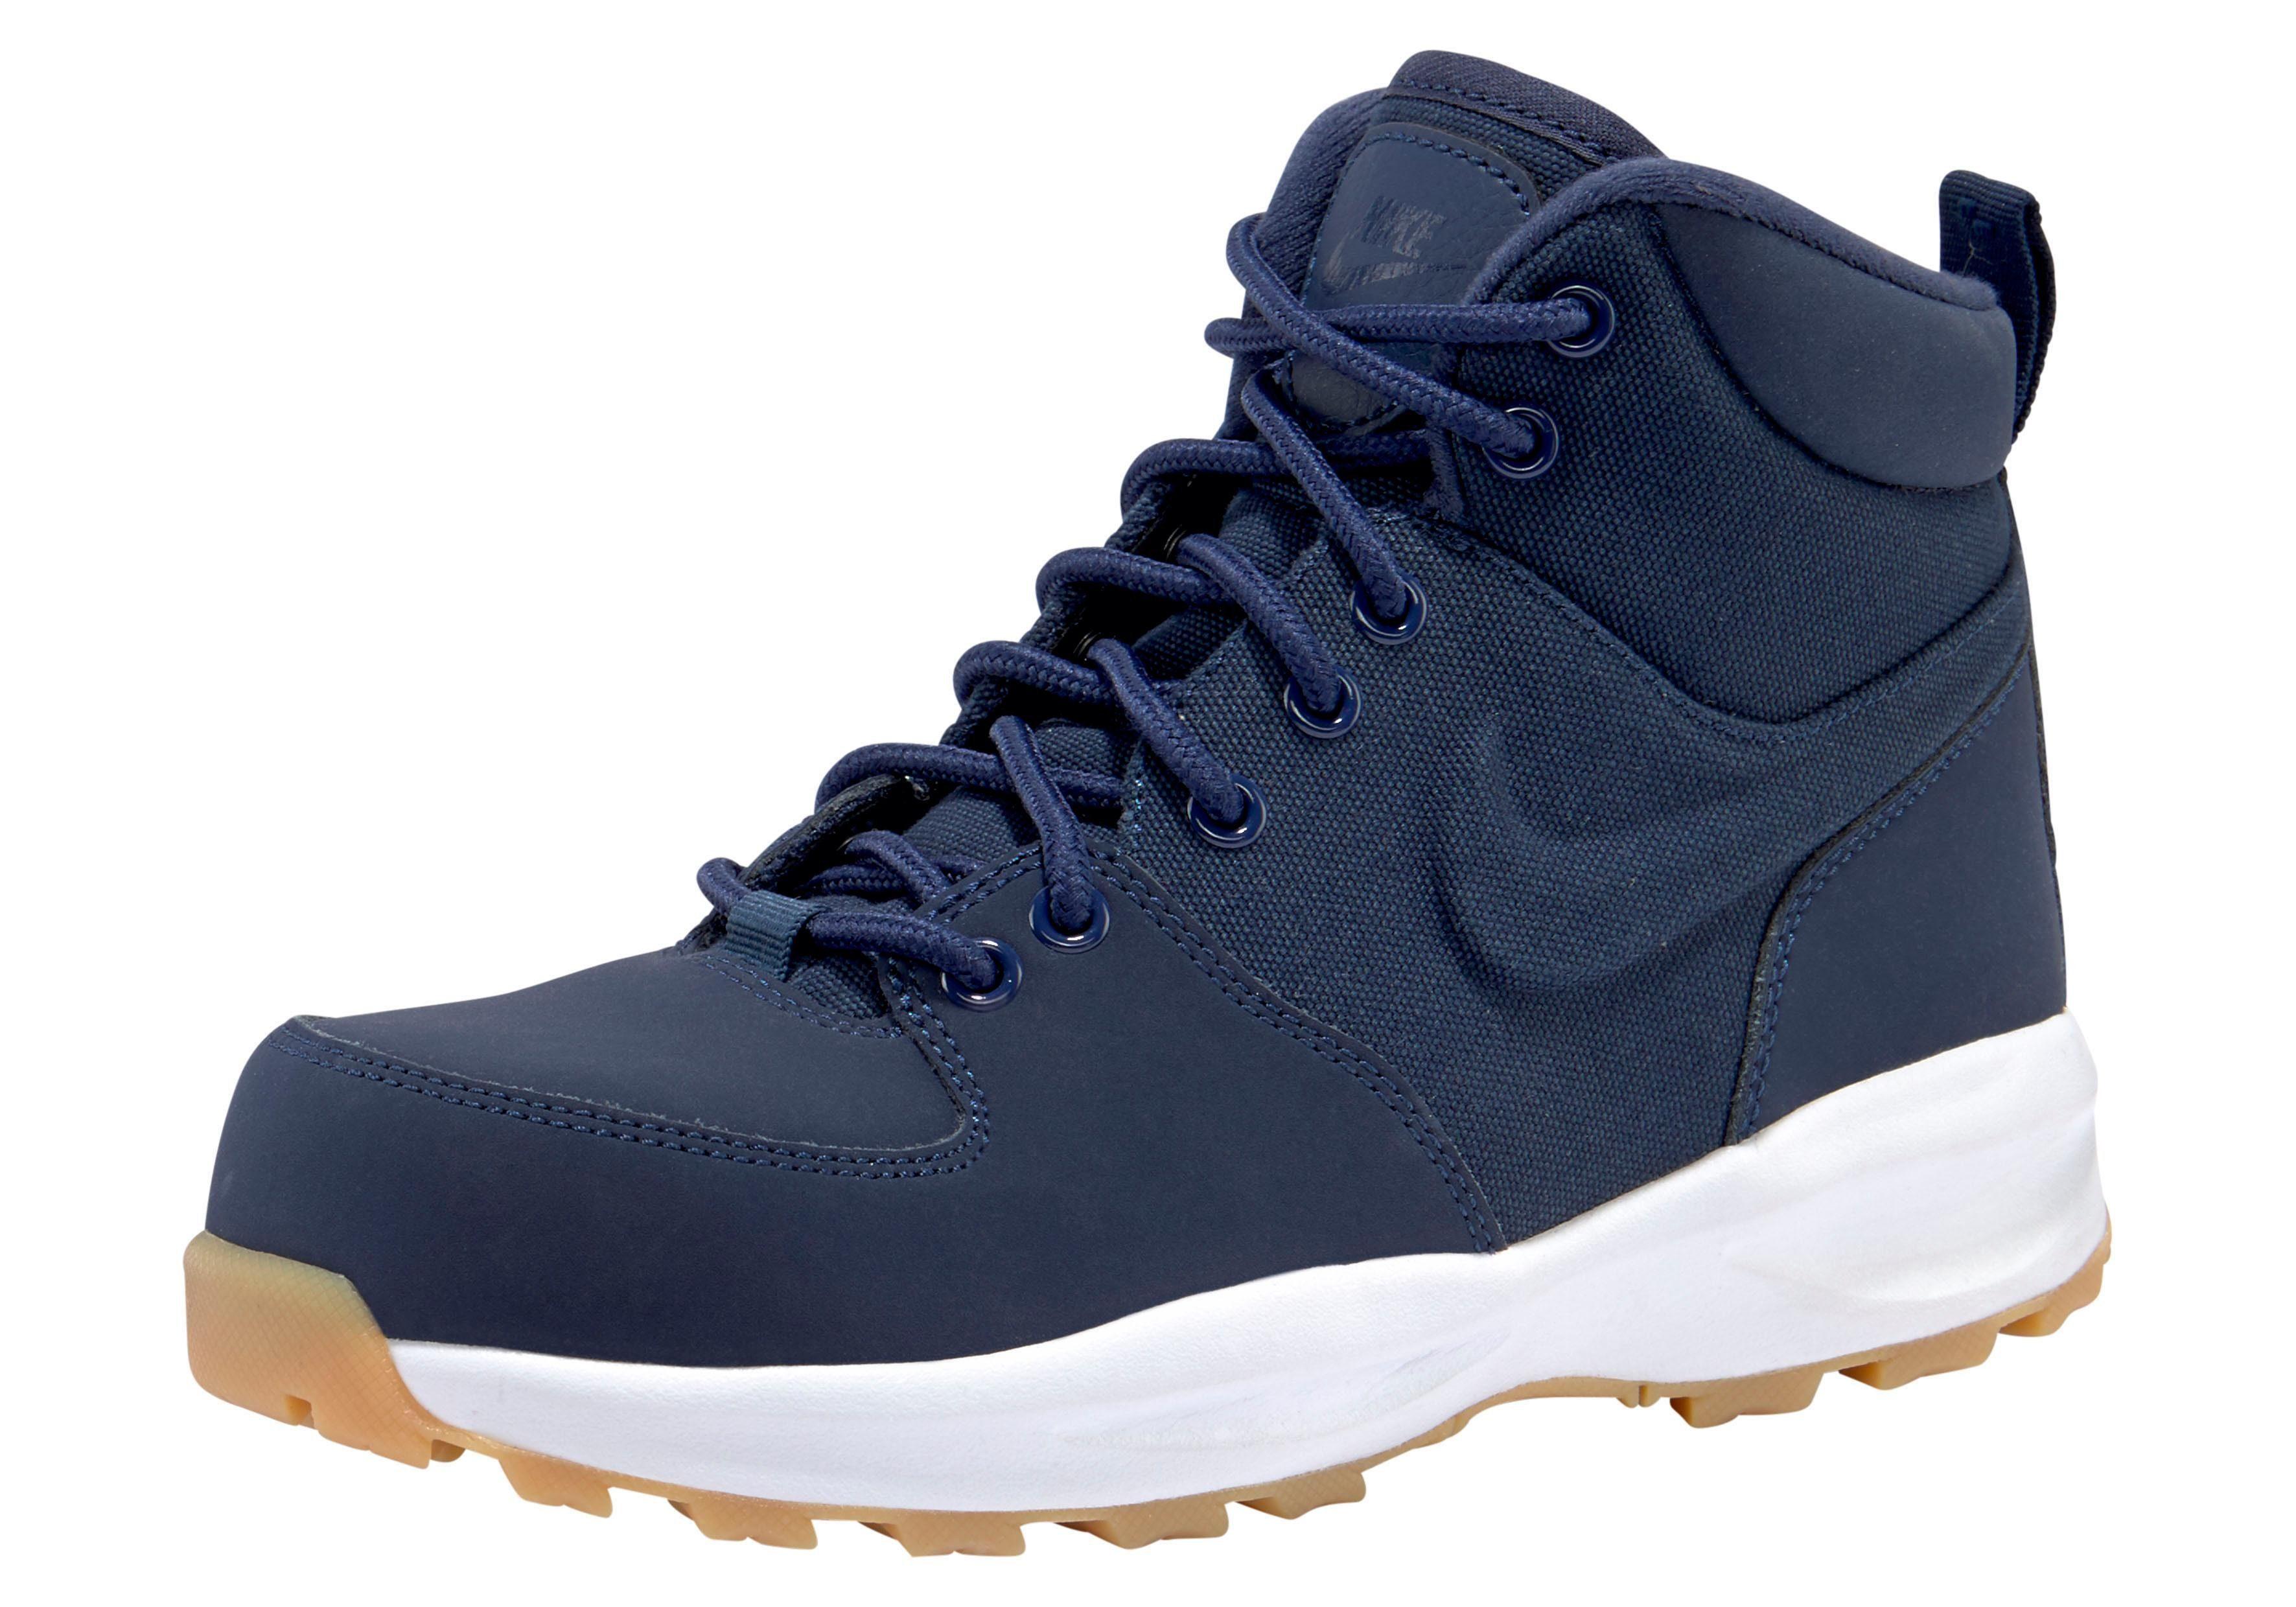 Nike Sportswear »Manoa 17« Schnürboots kaufen   OTTO